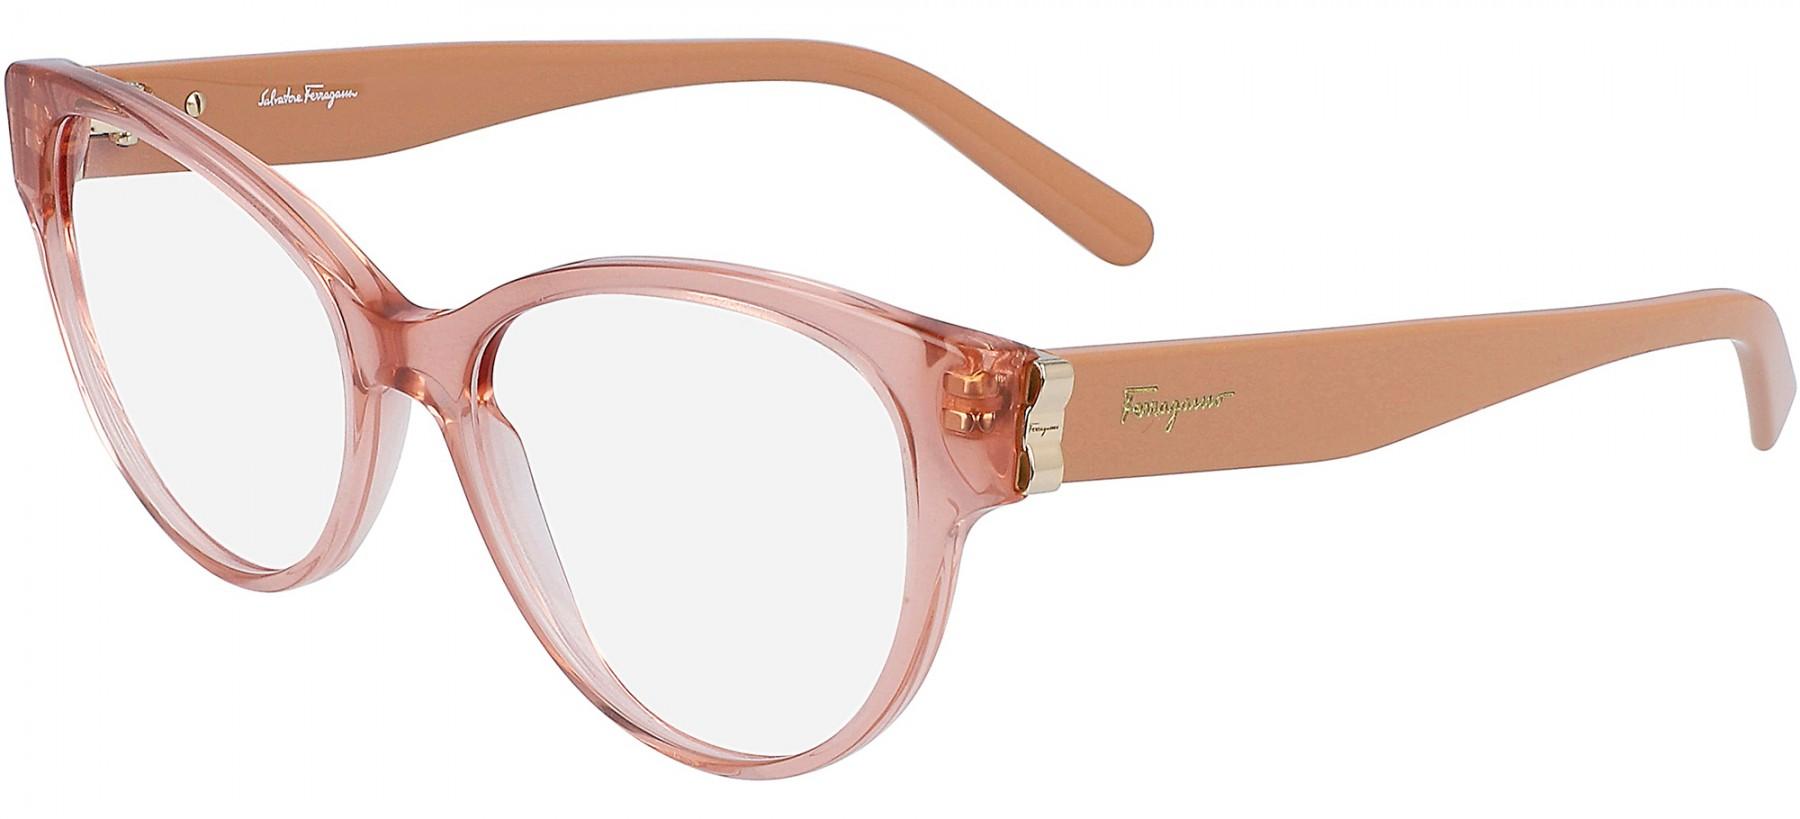 Salvatore Ferragamo 2863 749 - Oculos de Grau